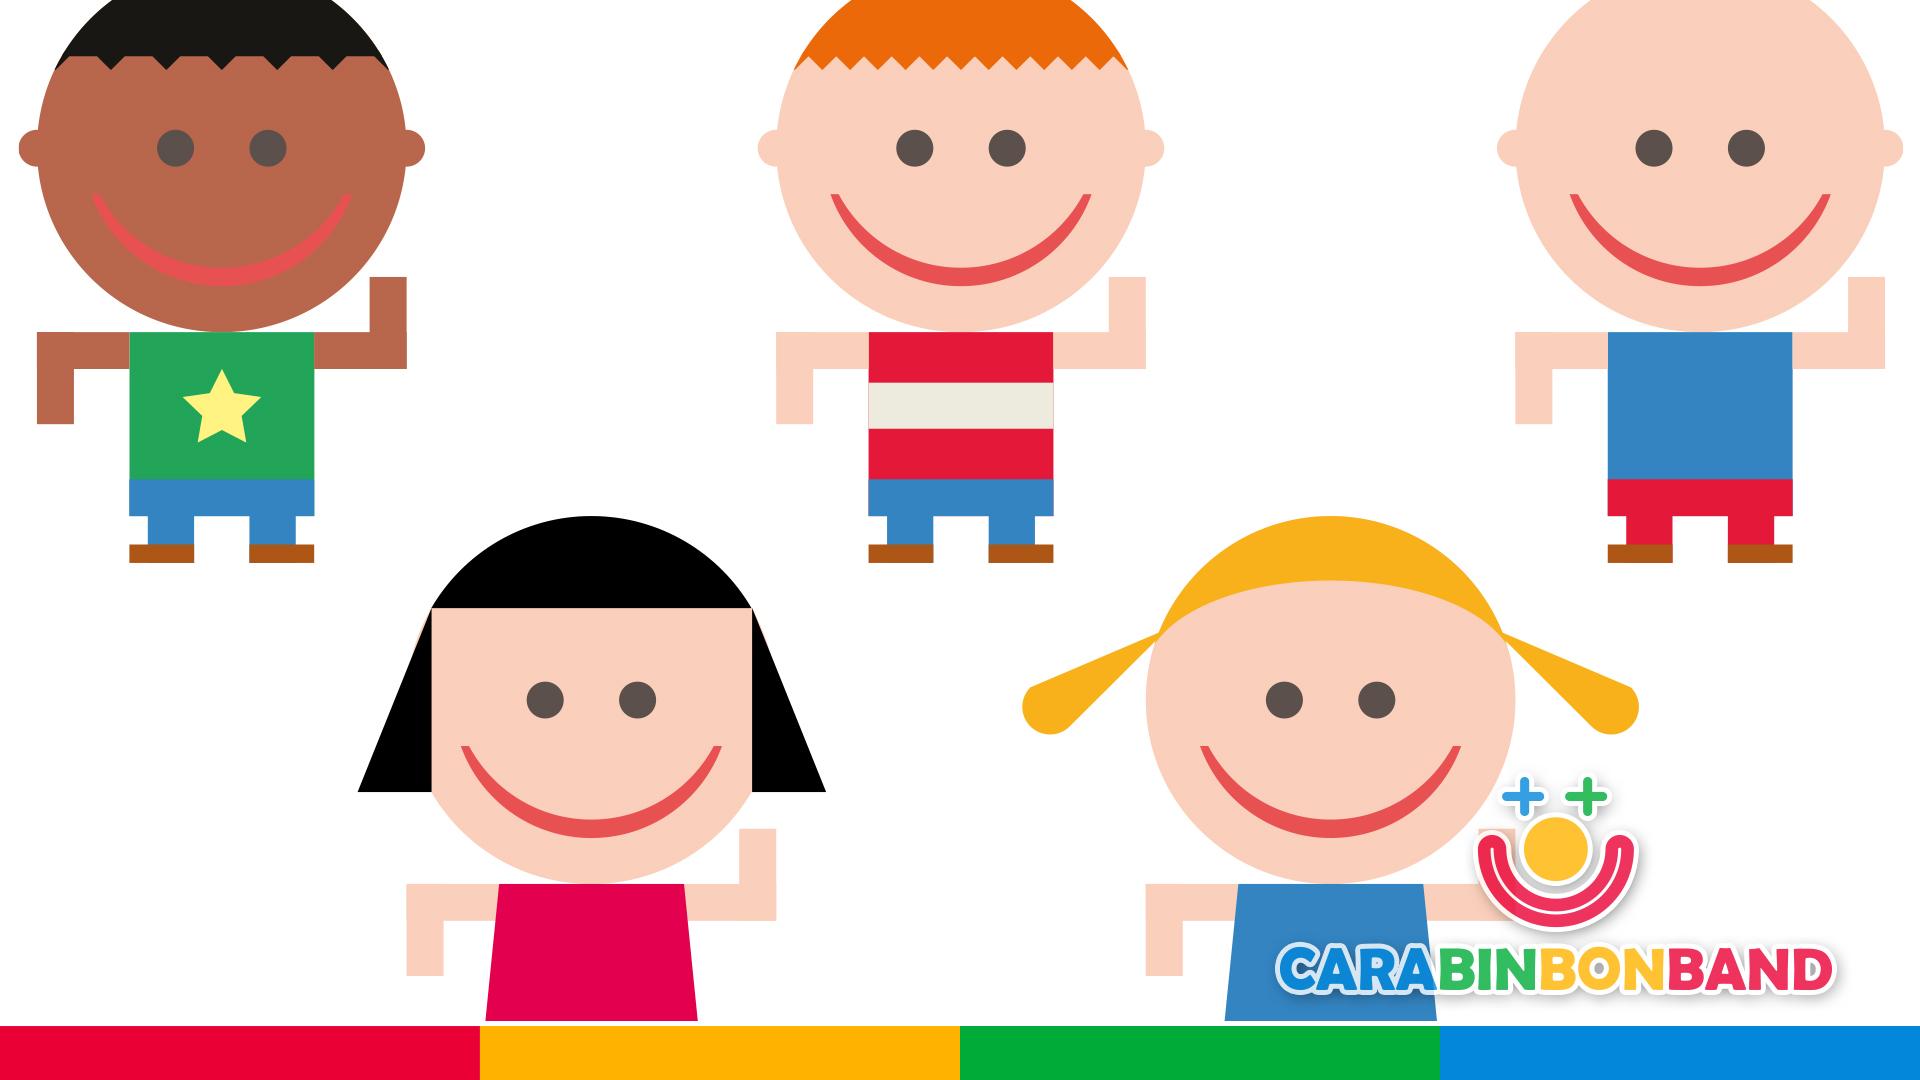 Carabin bon ban - children's songs - Spanish traditional and popular games